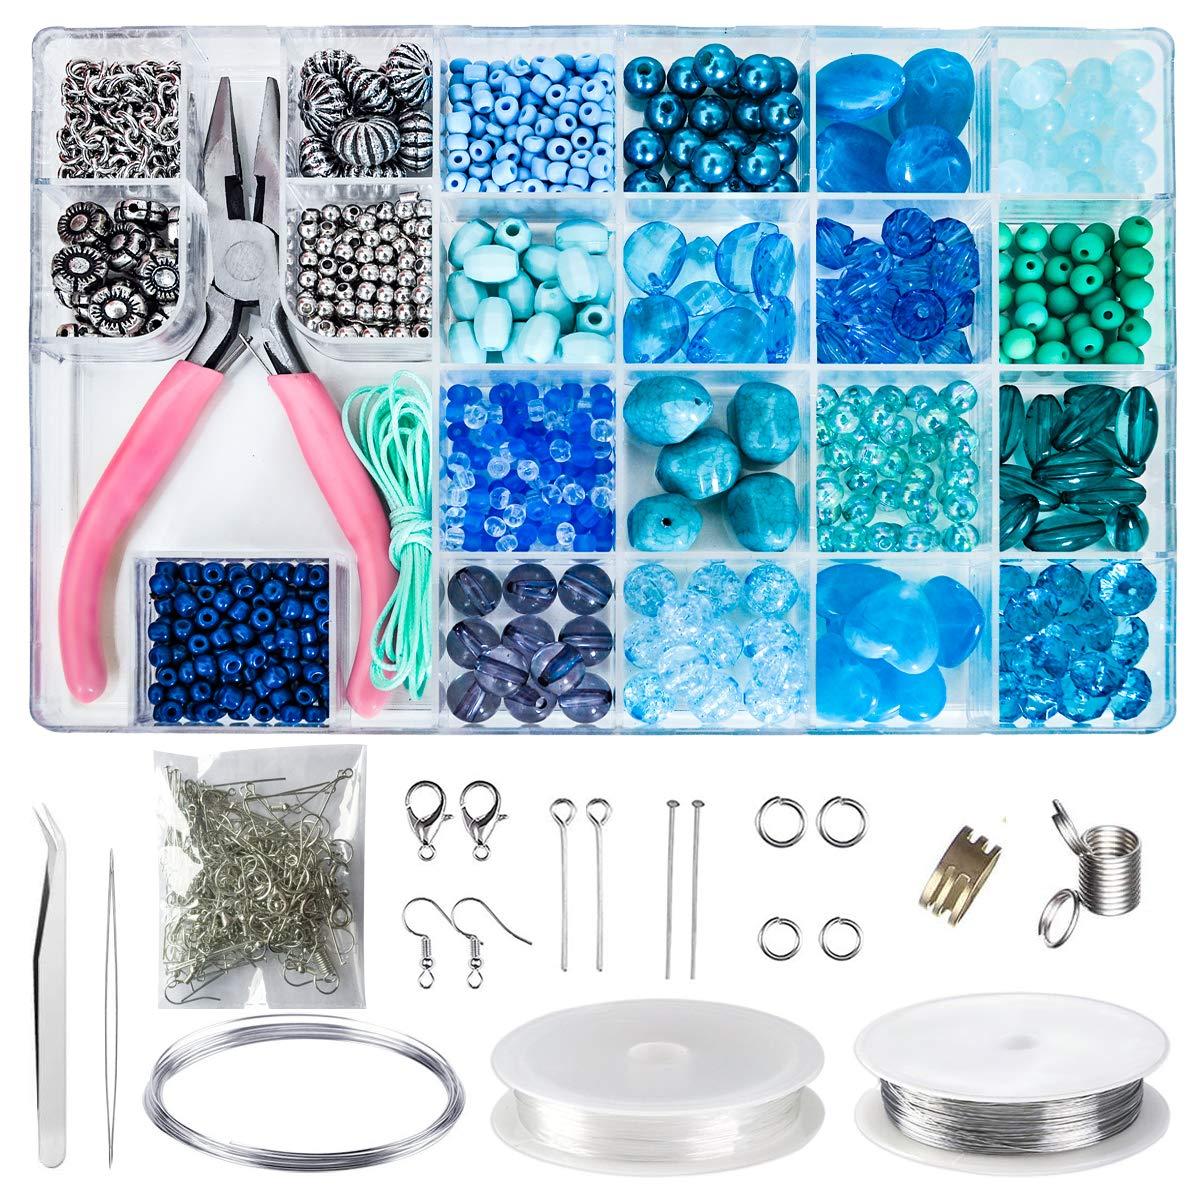 Jewelry Making Kit, Beginners Jewelry Kit Jewelry Making Starter Kit Beading Starter Kit Girl's Jewelry Making Beads Kit Include All Needed Beads, Jewelry Making Supplies for Adults, Girls,Teens